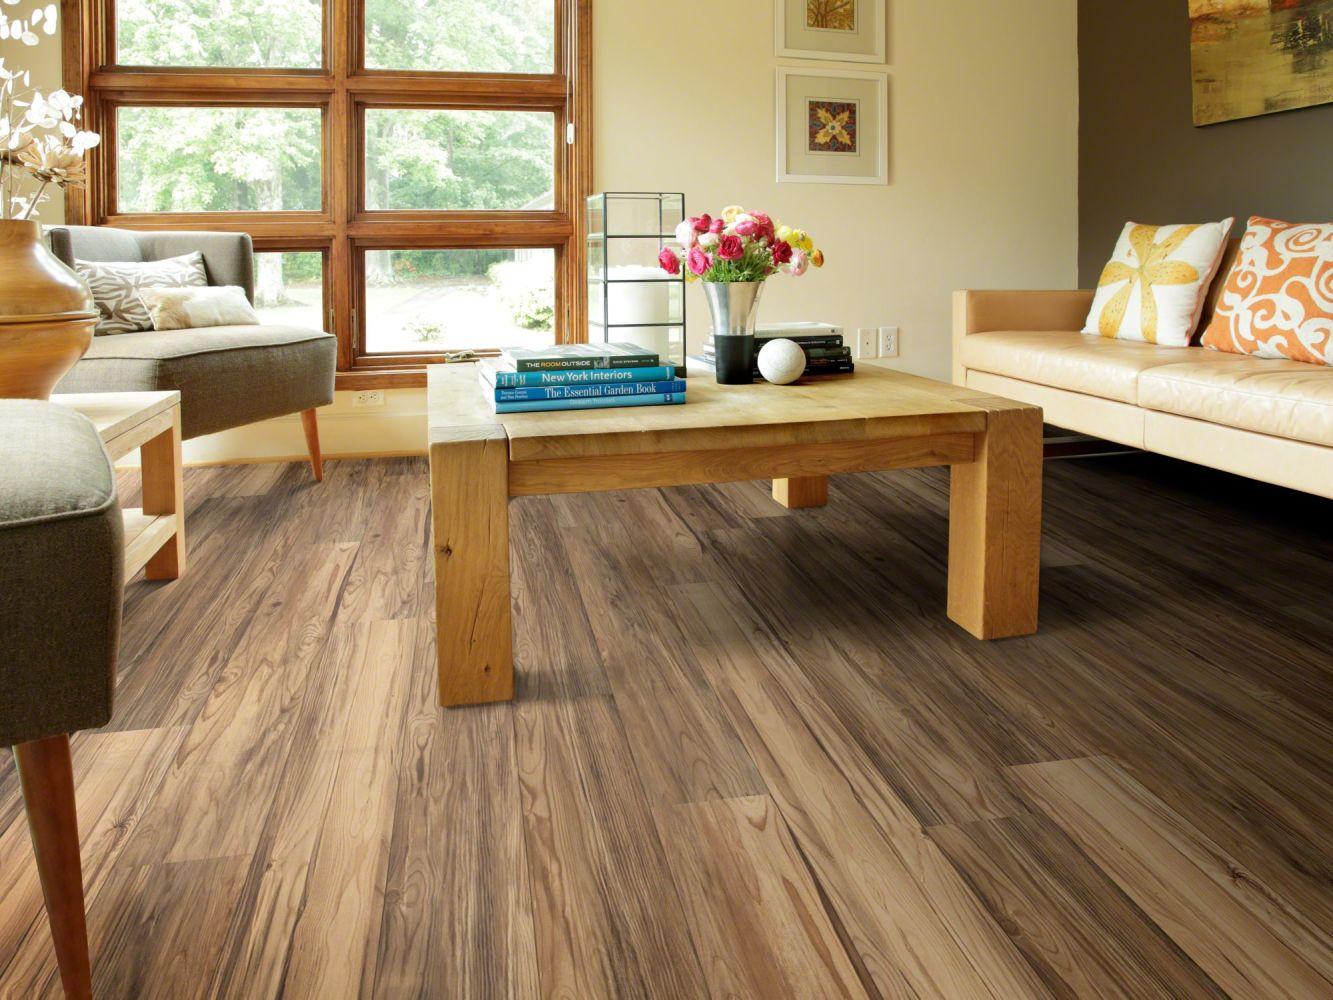 Shaw Floors Dr Horton Arabesque Pla + Caplone 00676_DR013